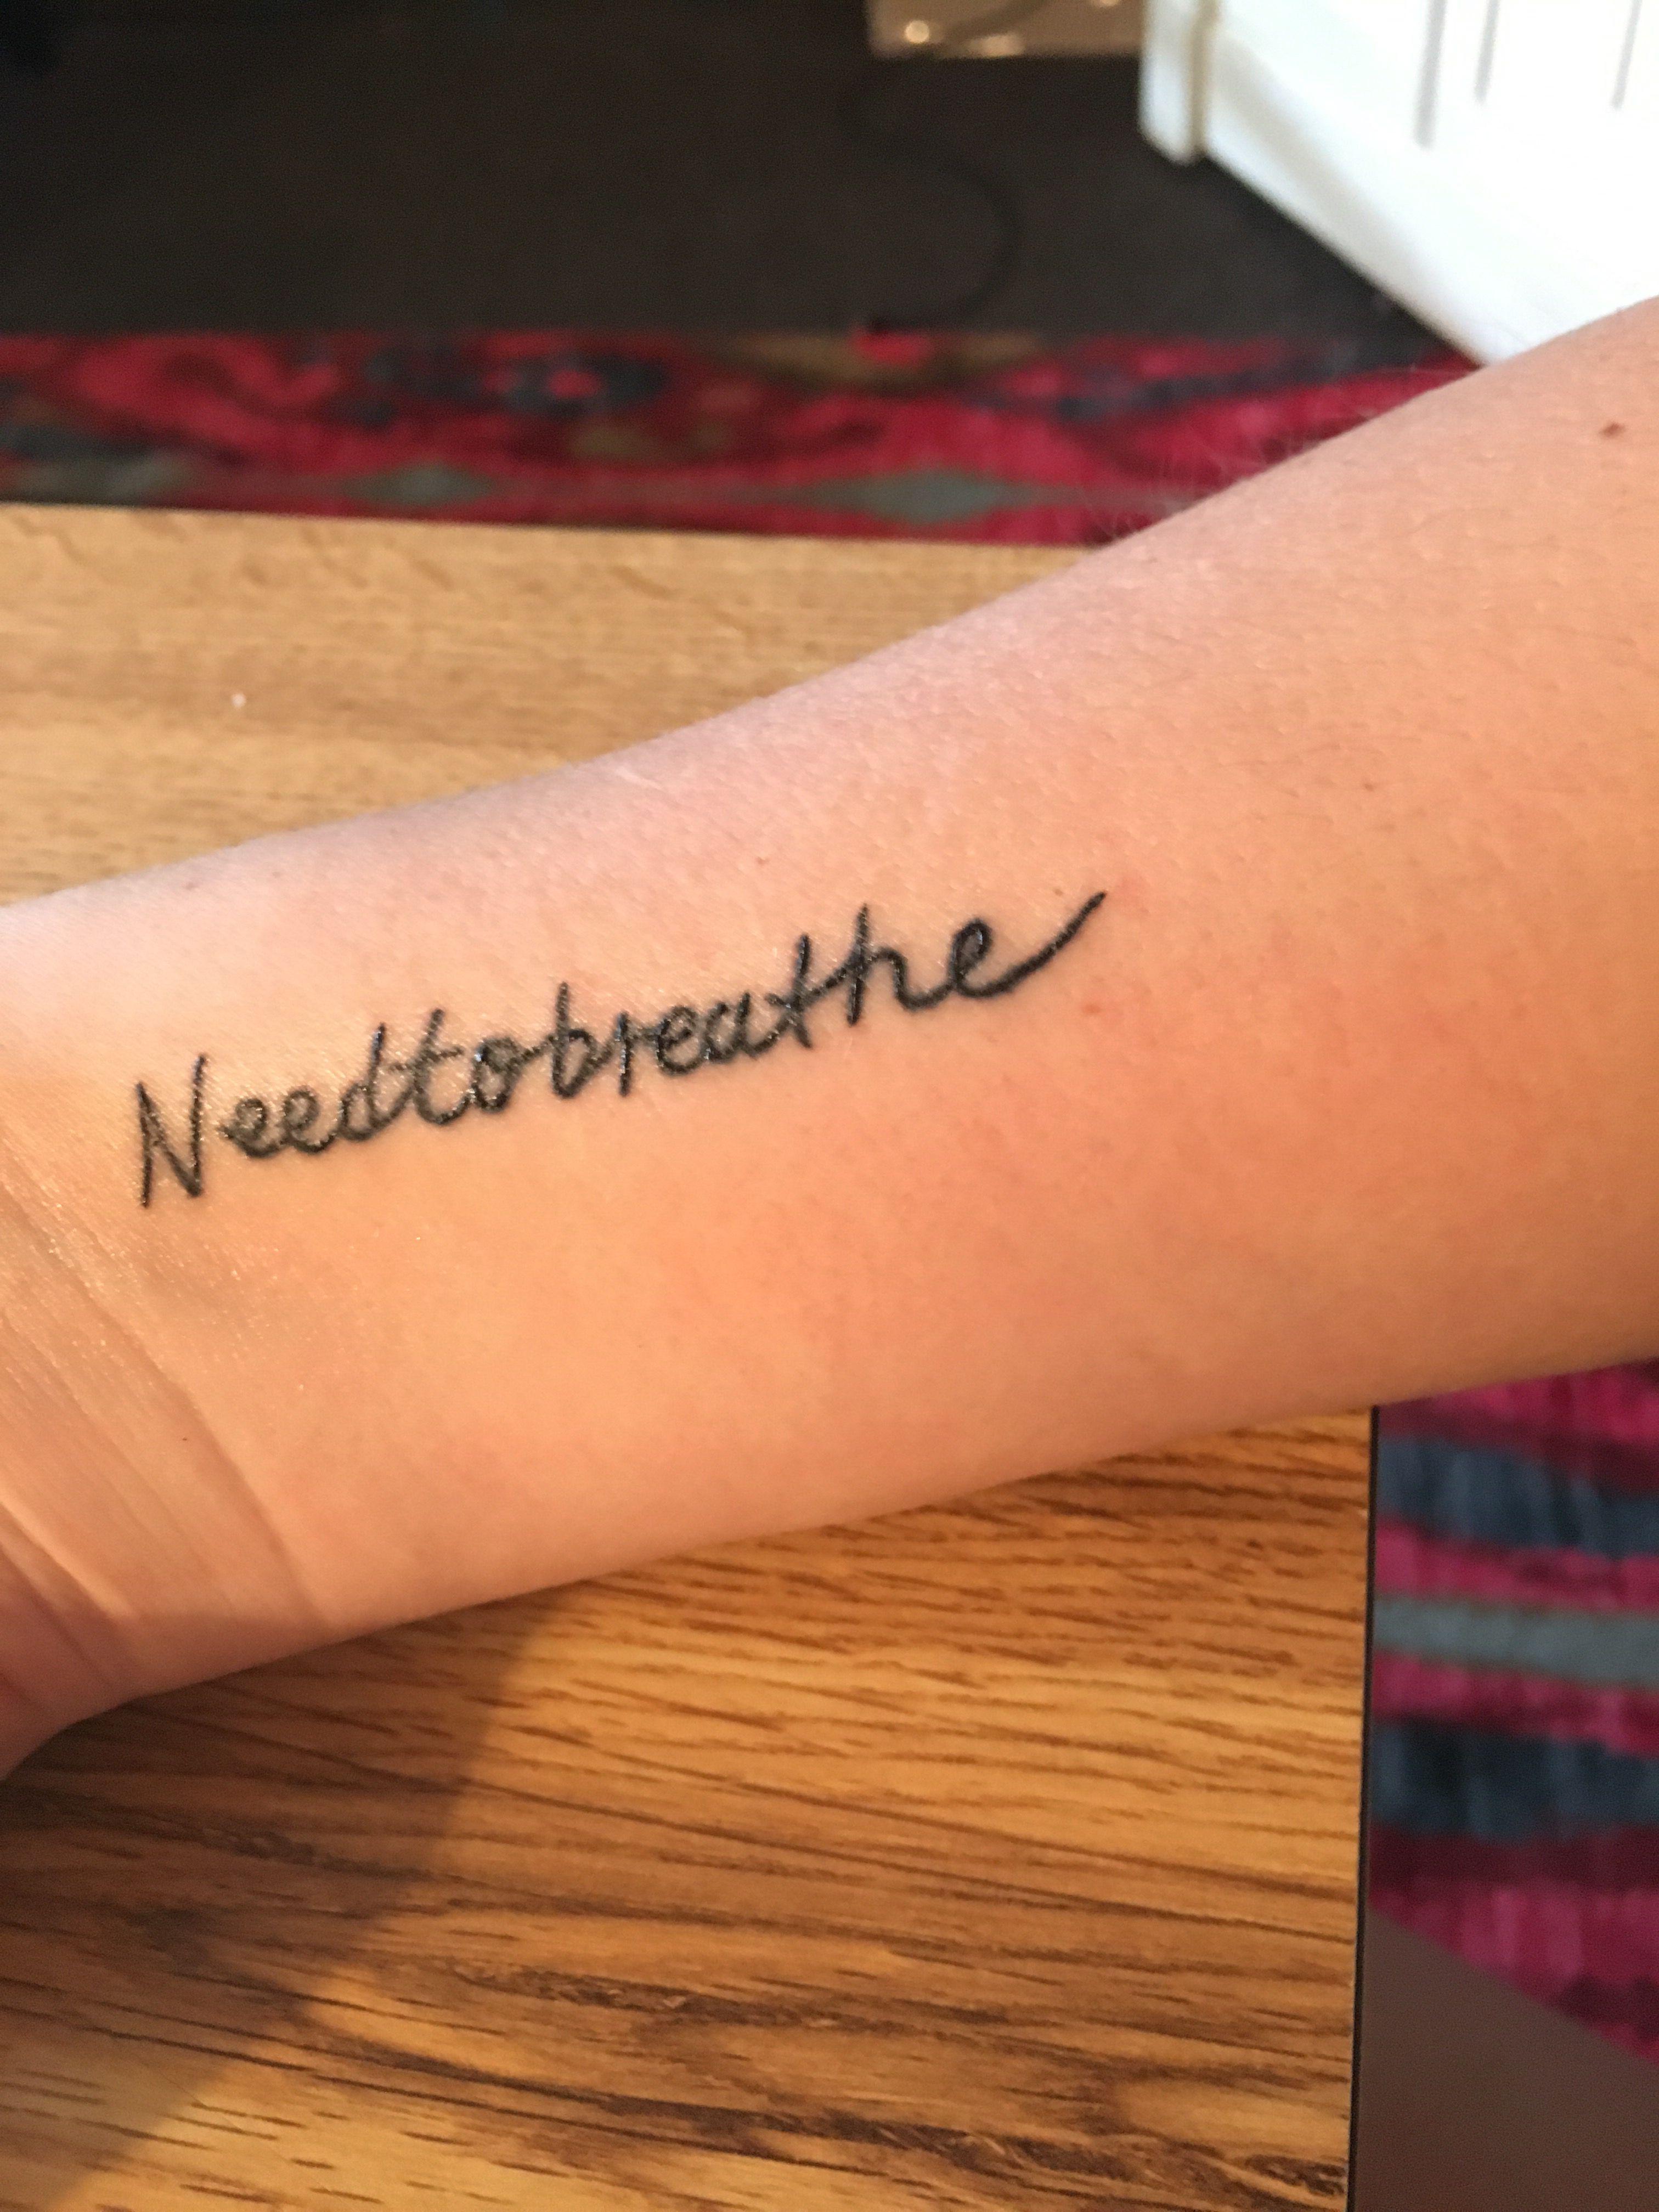 cd43eba4b221e Needtobreathe tattoo   Tattoos Ideas   Tattoos, Tattoo quotes, Piercings